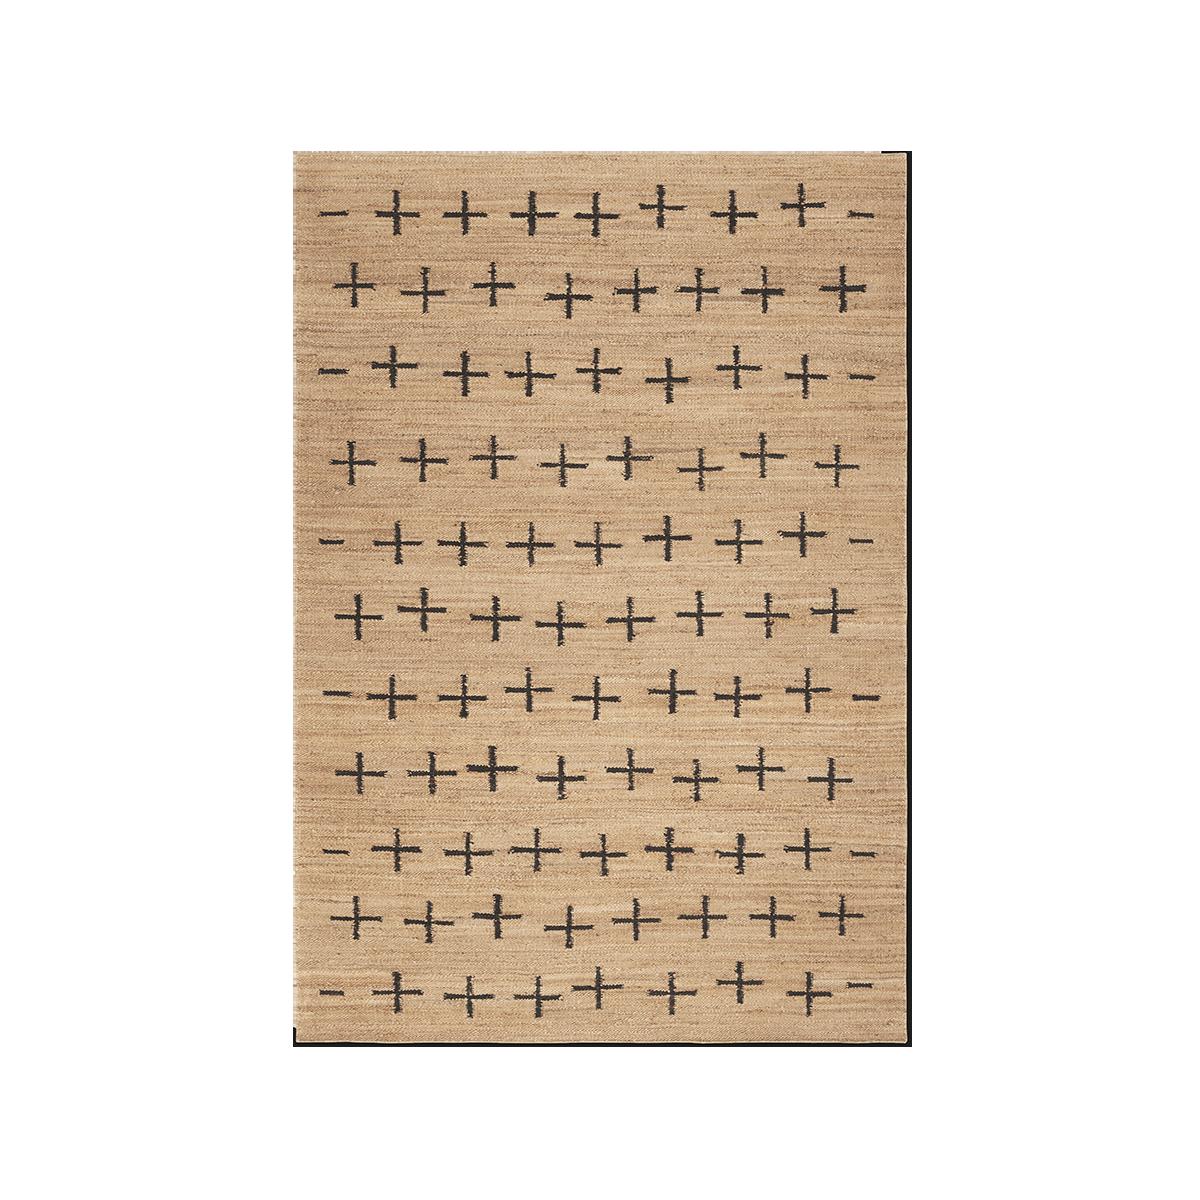 Product image of Jute Cross Black, a jute rug with black crosses spread across it.